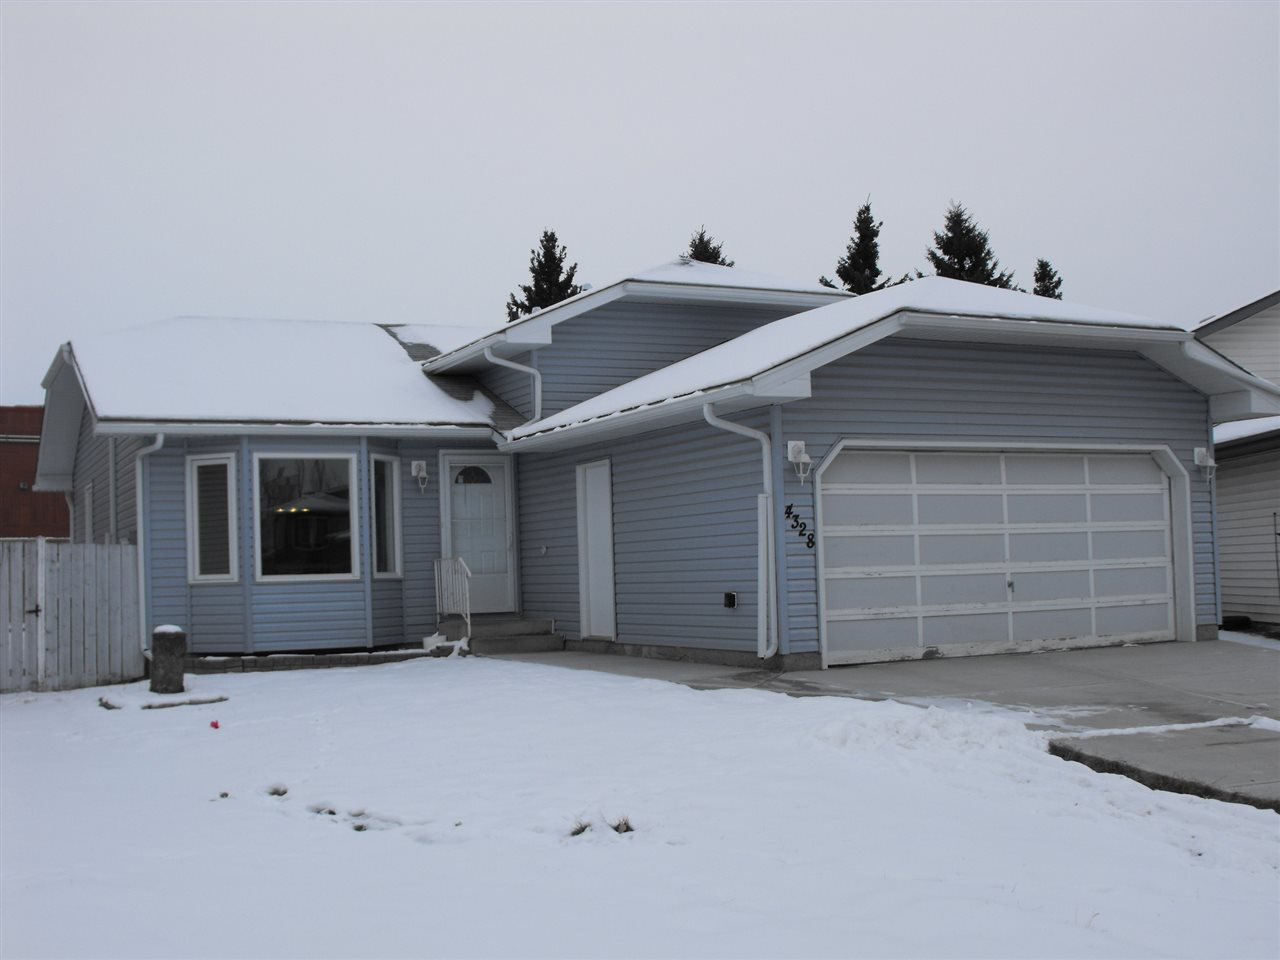 Main Photo: 4328 21 Avenue in Edmonton: Zone 29 House for sale : MLS®# E4183290